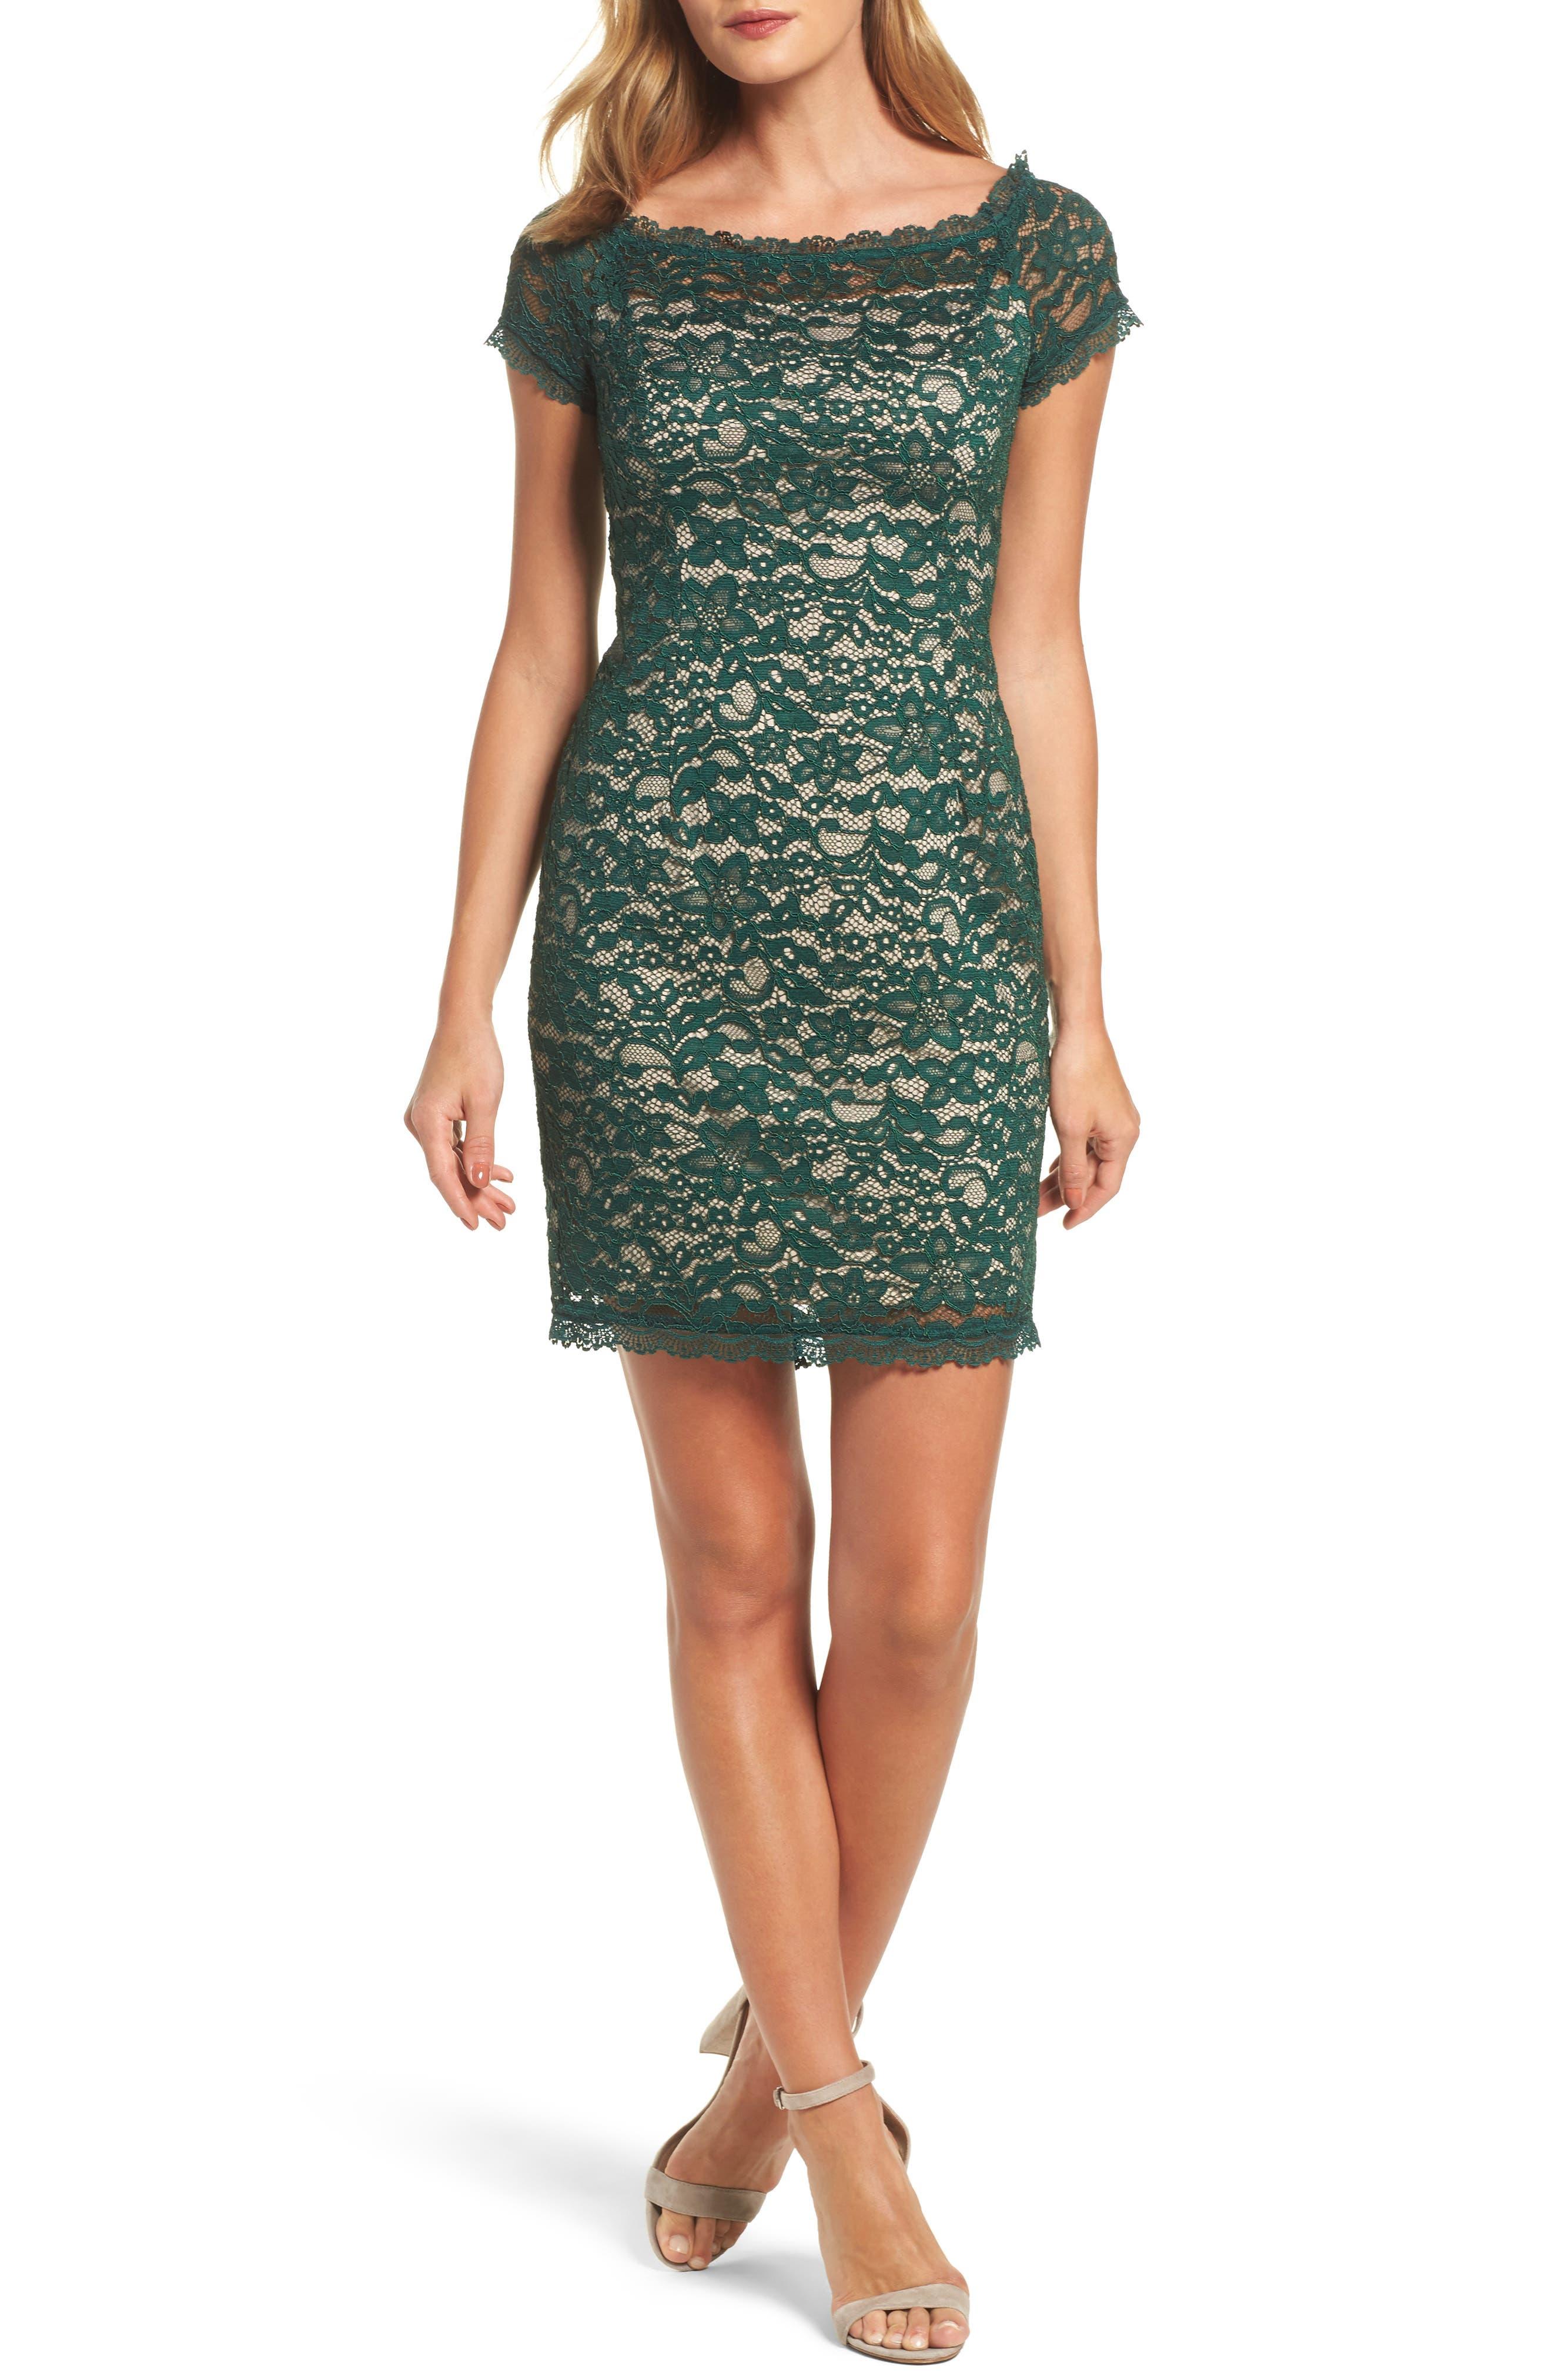 Adrianna Papell Aubrey Lace Sheath Dress